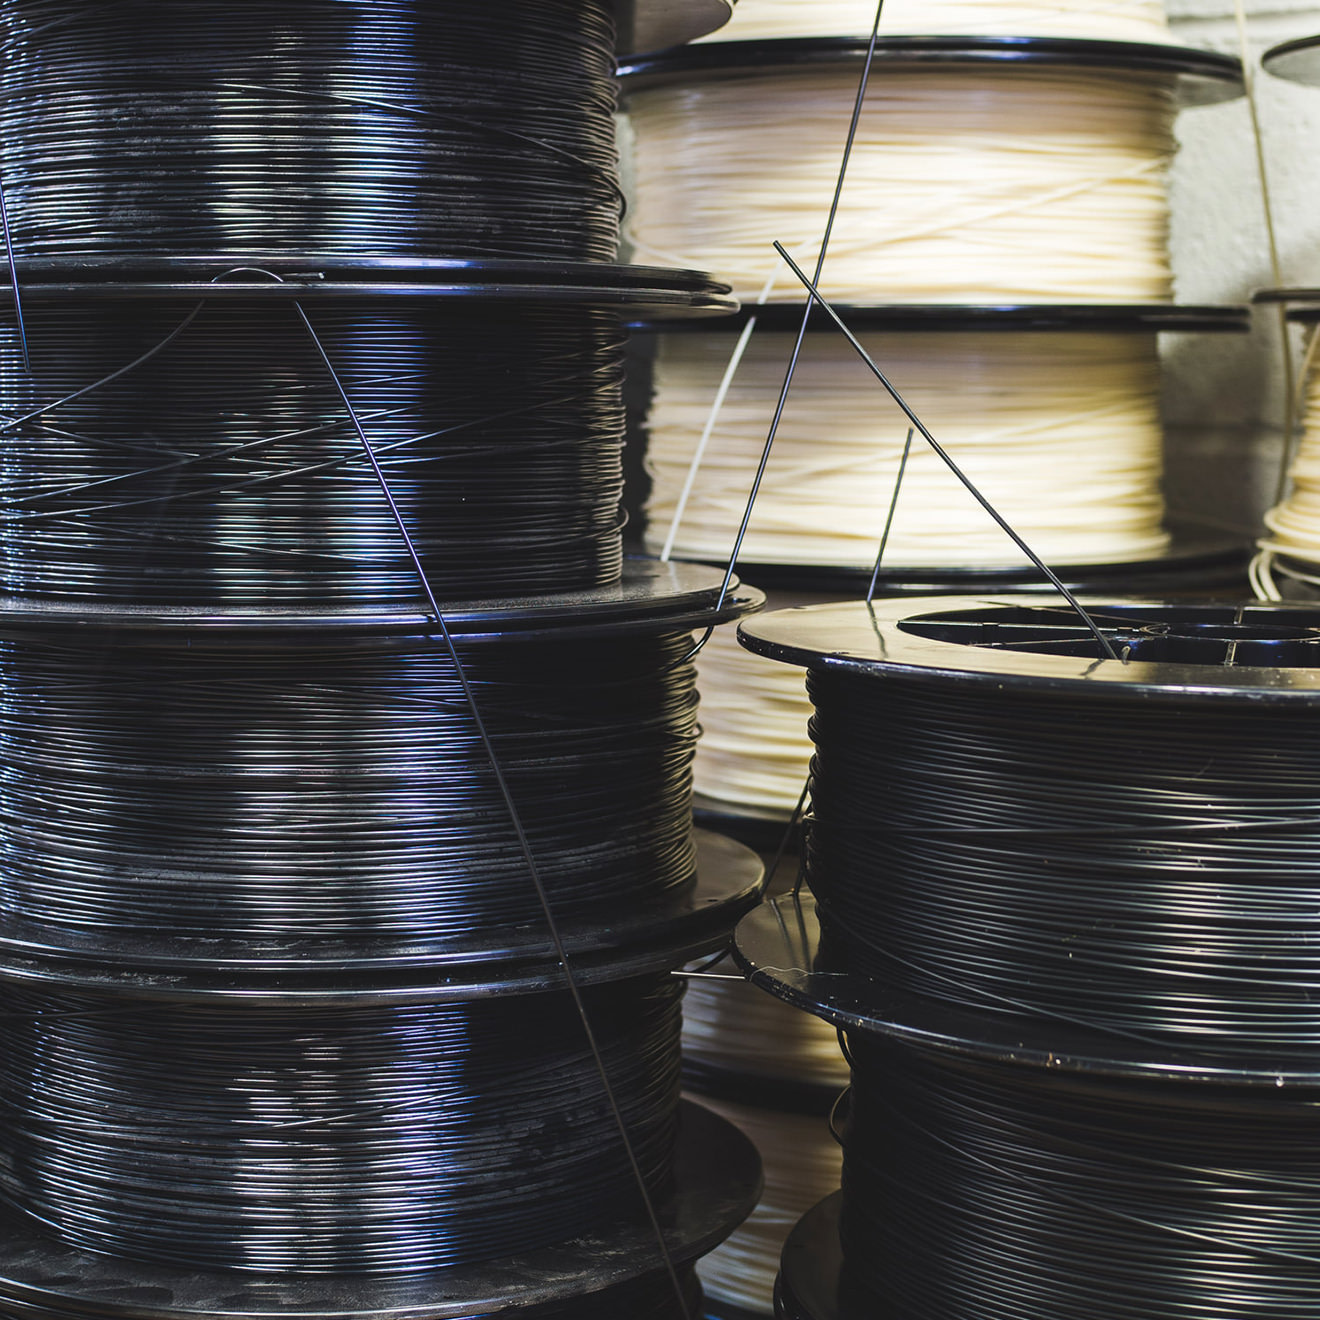 Black spools of 3D printing plastic